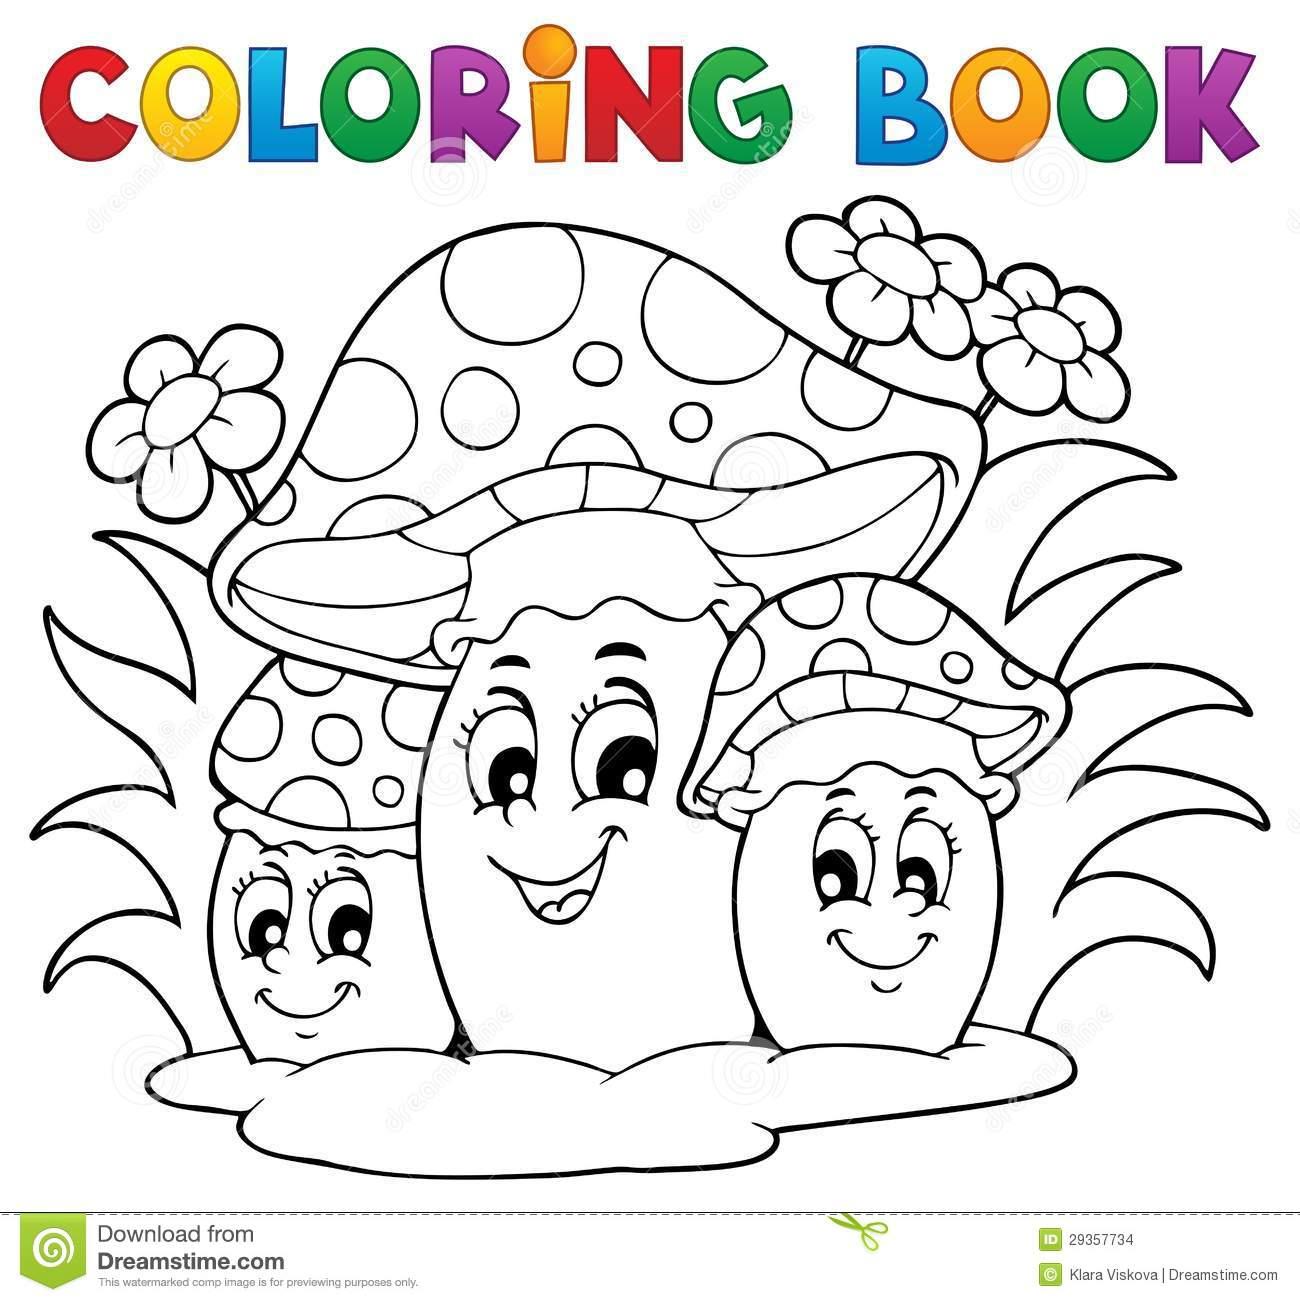 Coloring books - Coloring Book3 Jpg